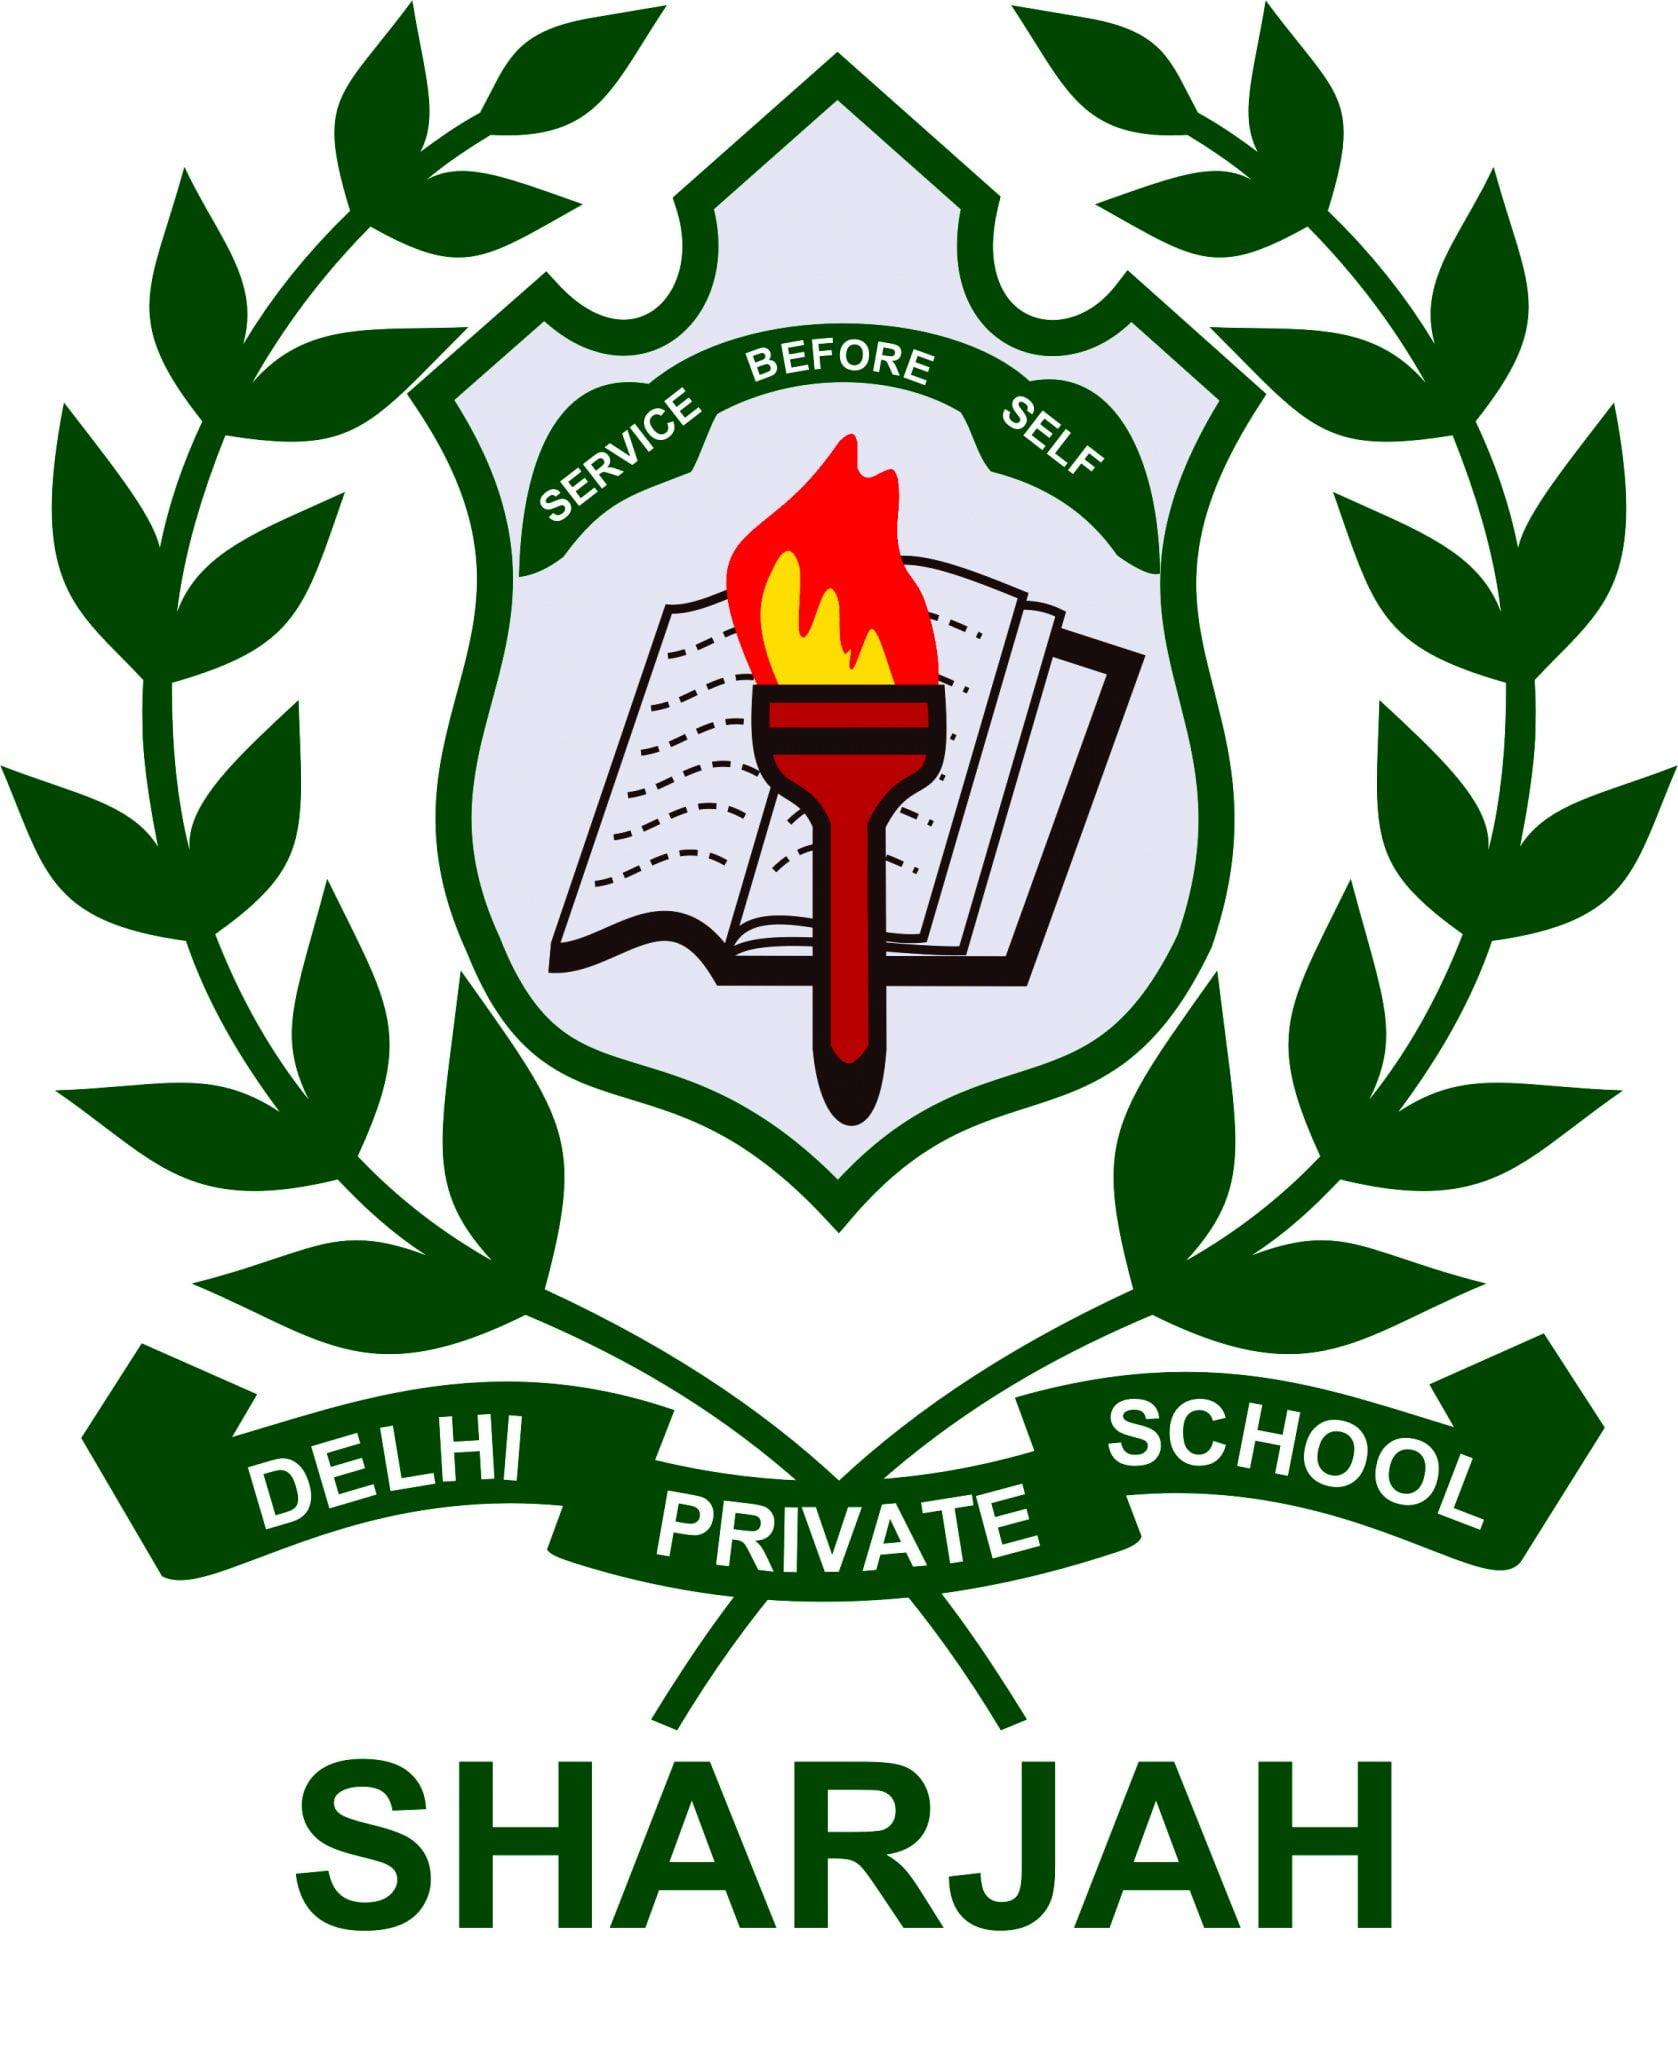 delhi private school dps sharjah school zone muwailih